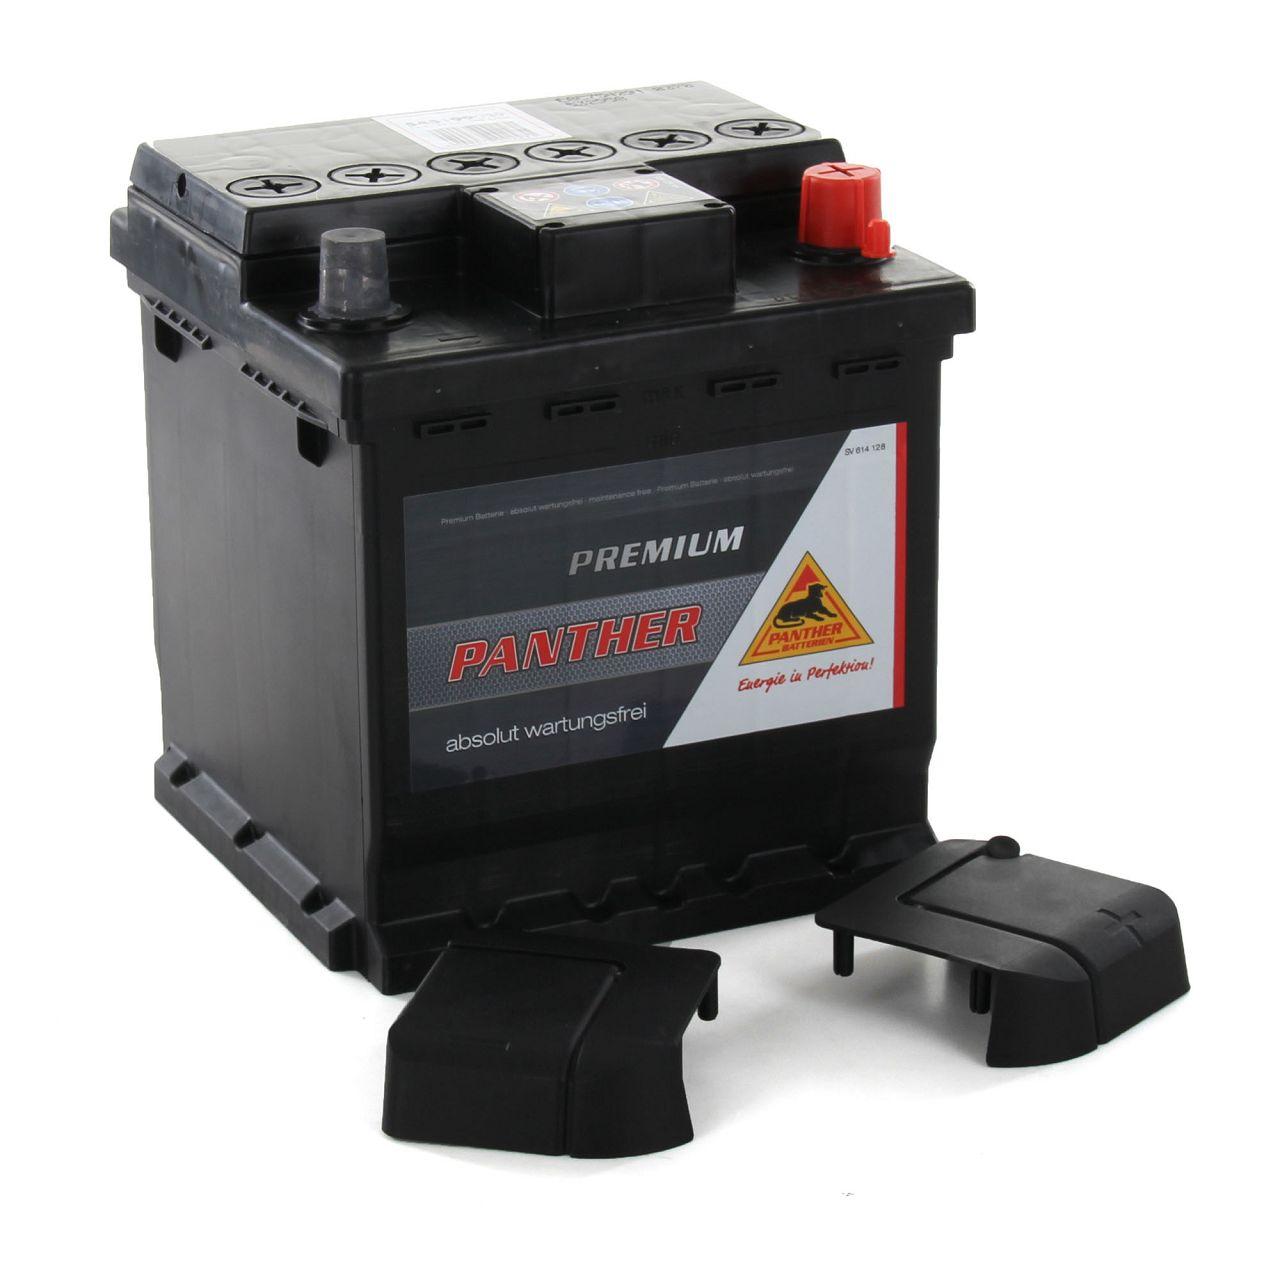 PANTHER Autobatterie Batterie Starterbatterie POWER BLOCK 12V 45Ah 390A